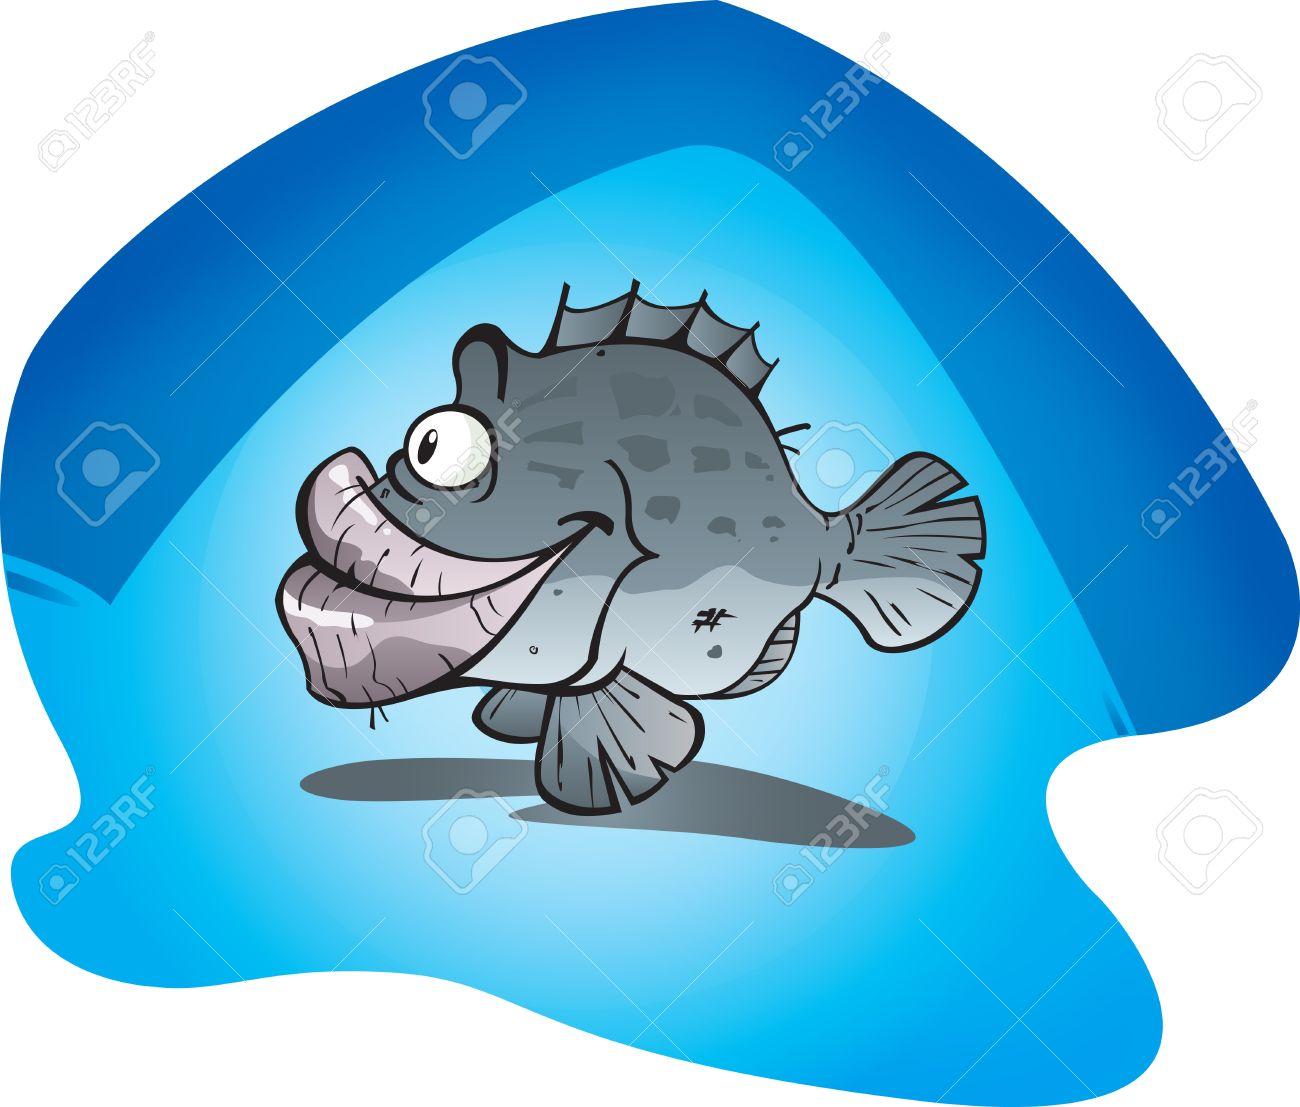 A large cartoon Cod fish. Stock Vector - 9284226